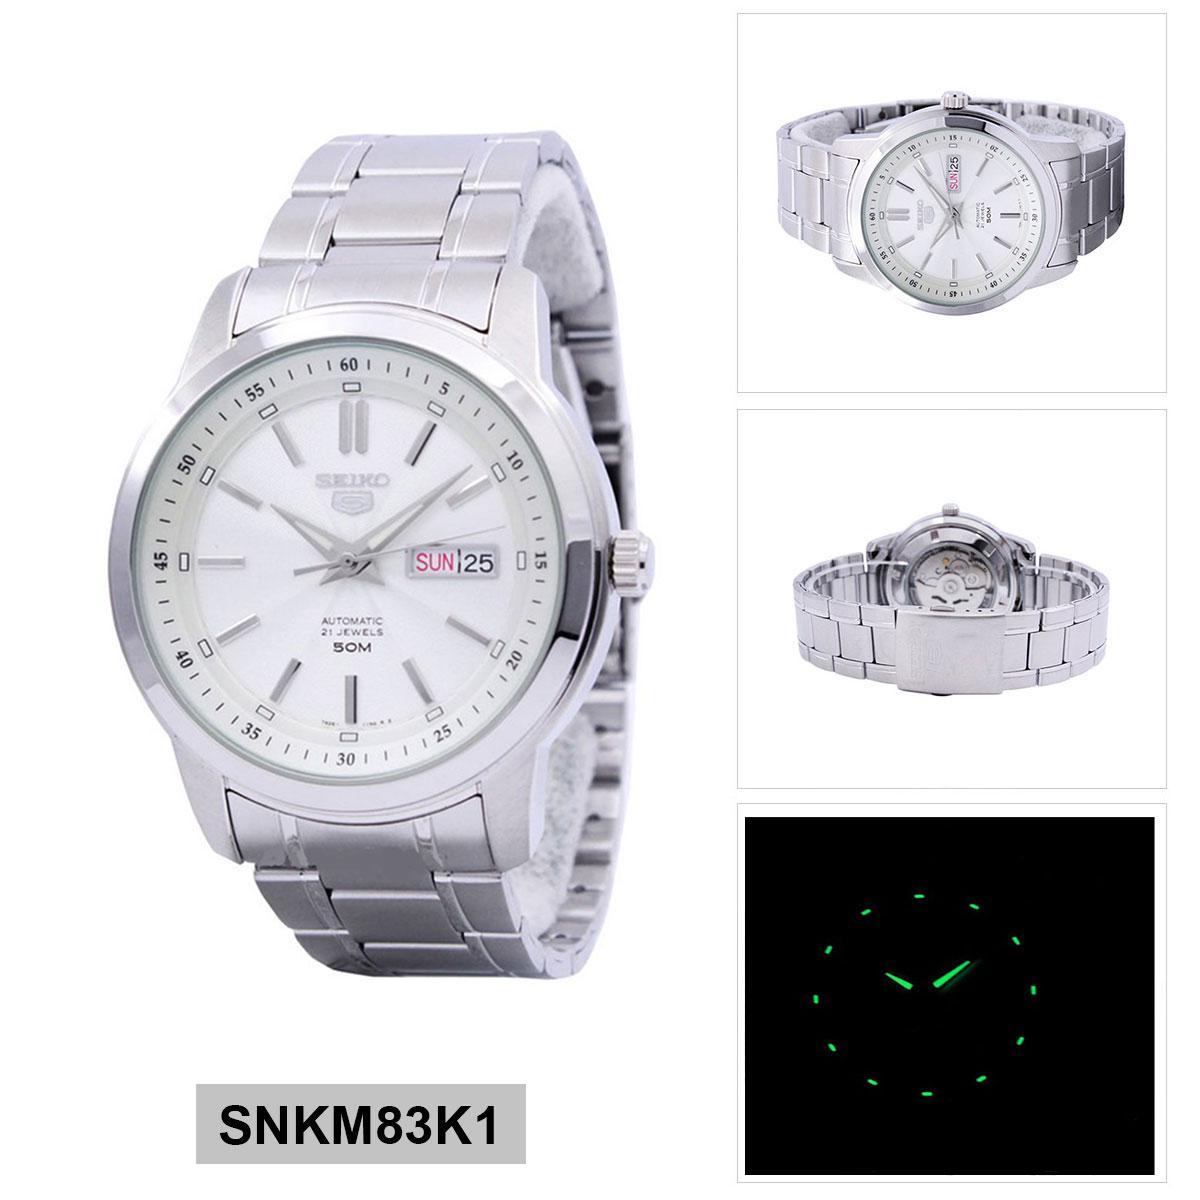 Seiko Seiko 5 Automatic Silver Stainless-Steel Case Stainless-Steel Bracelet Mens SNKM83K1